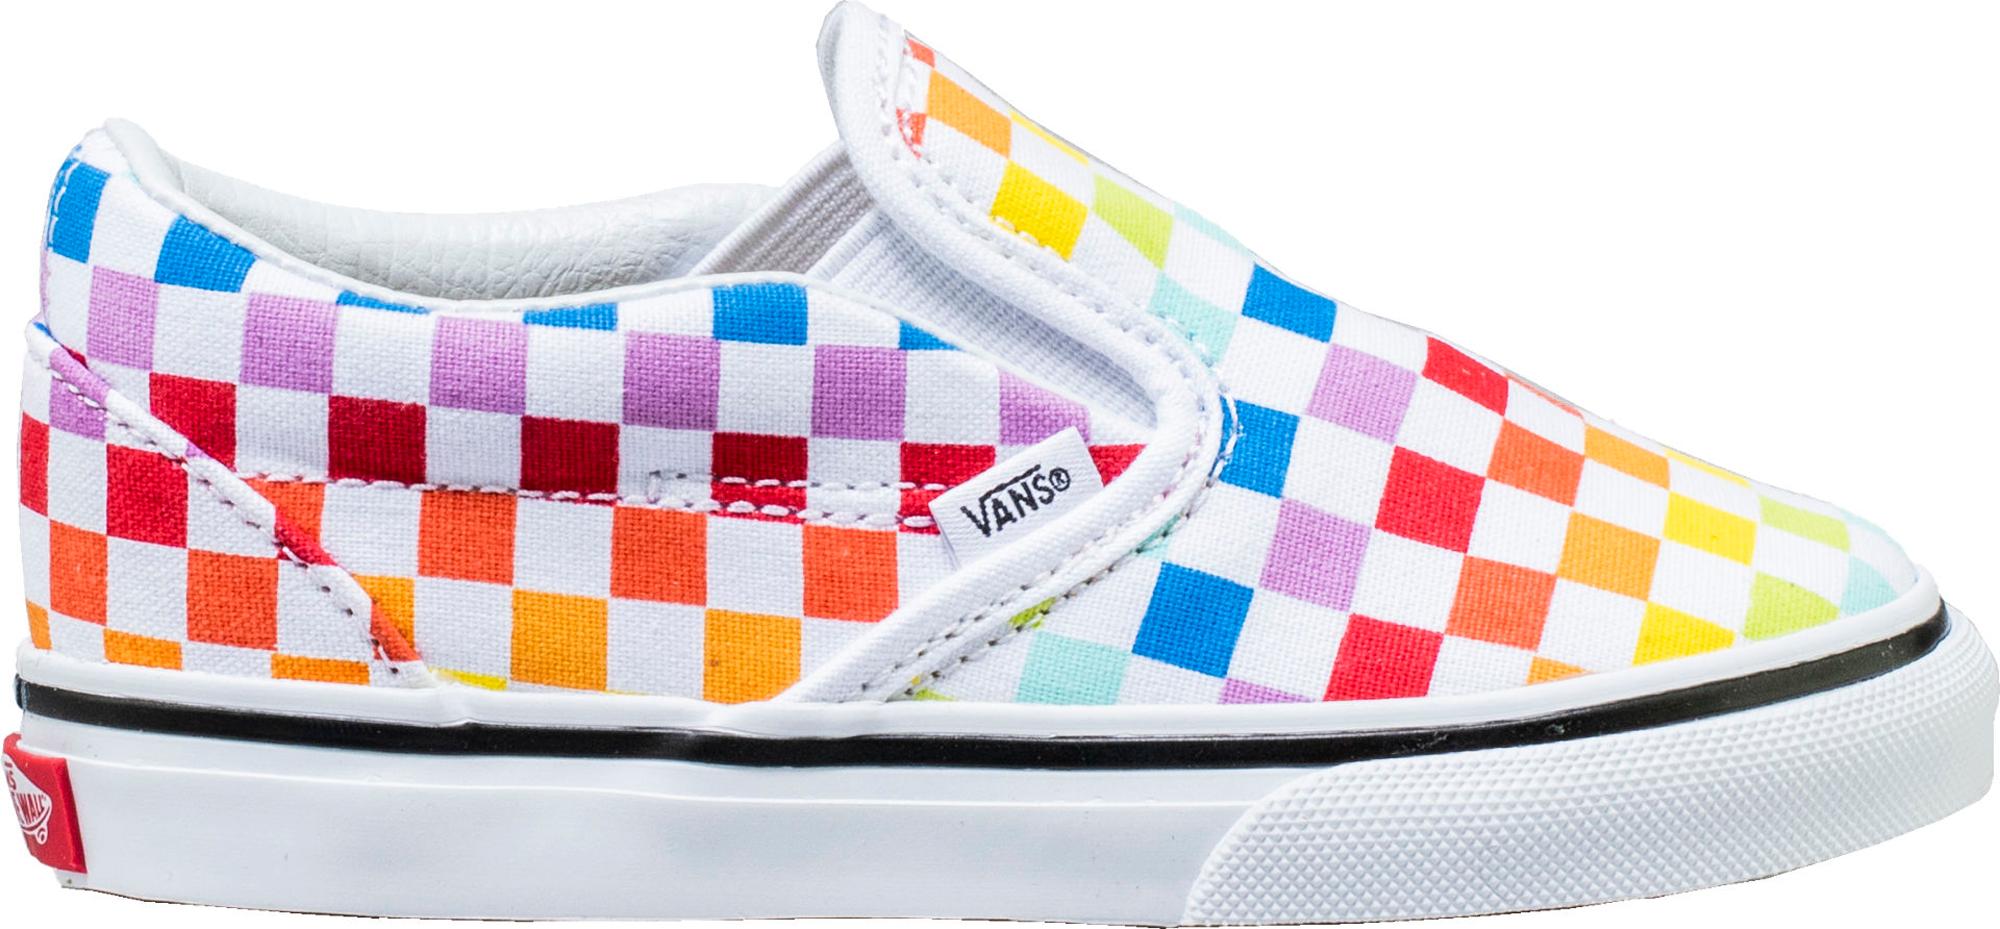 Vans Slip-On Rainbow Checkerboard (TD